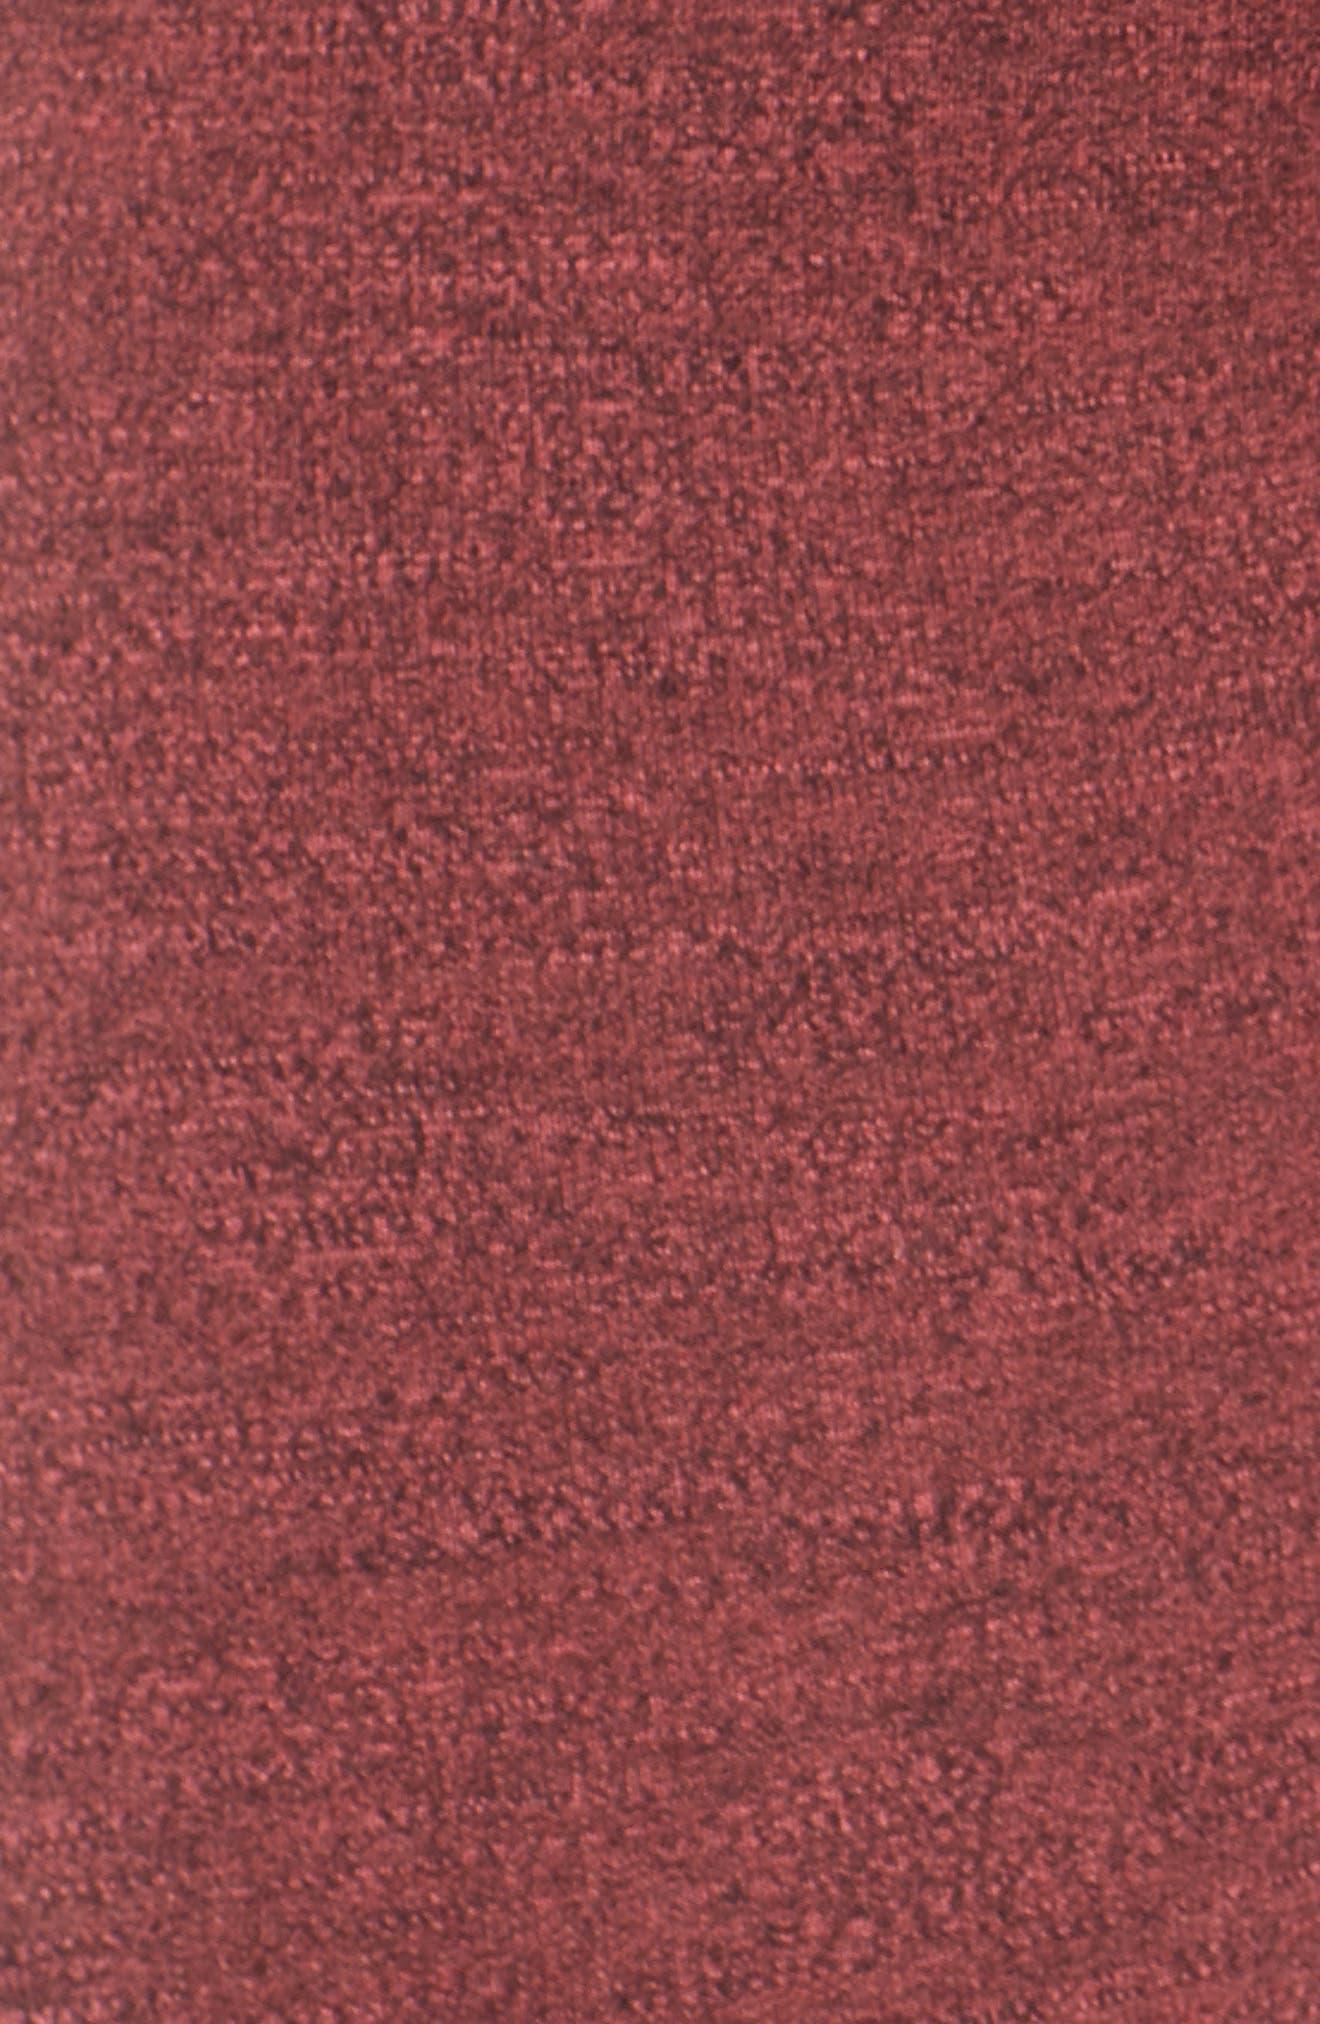 Active Stripe Yoga Pants,                             Alternate thumbnail 5, color,                             651